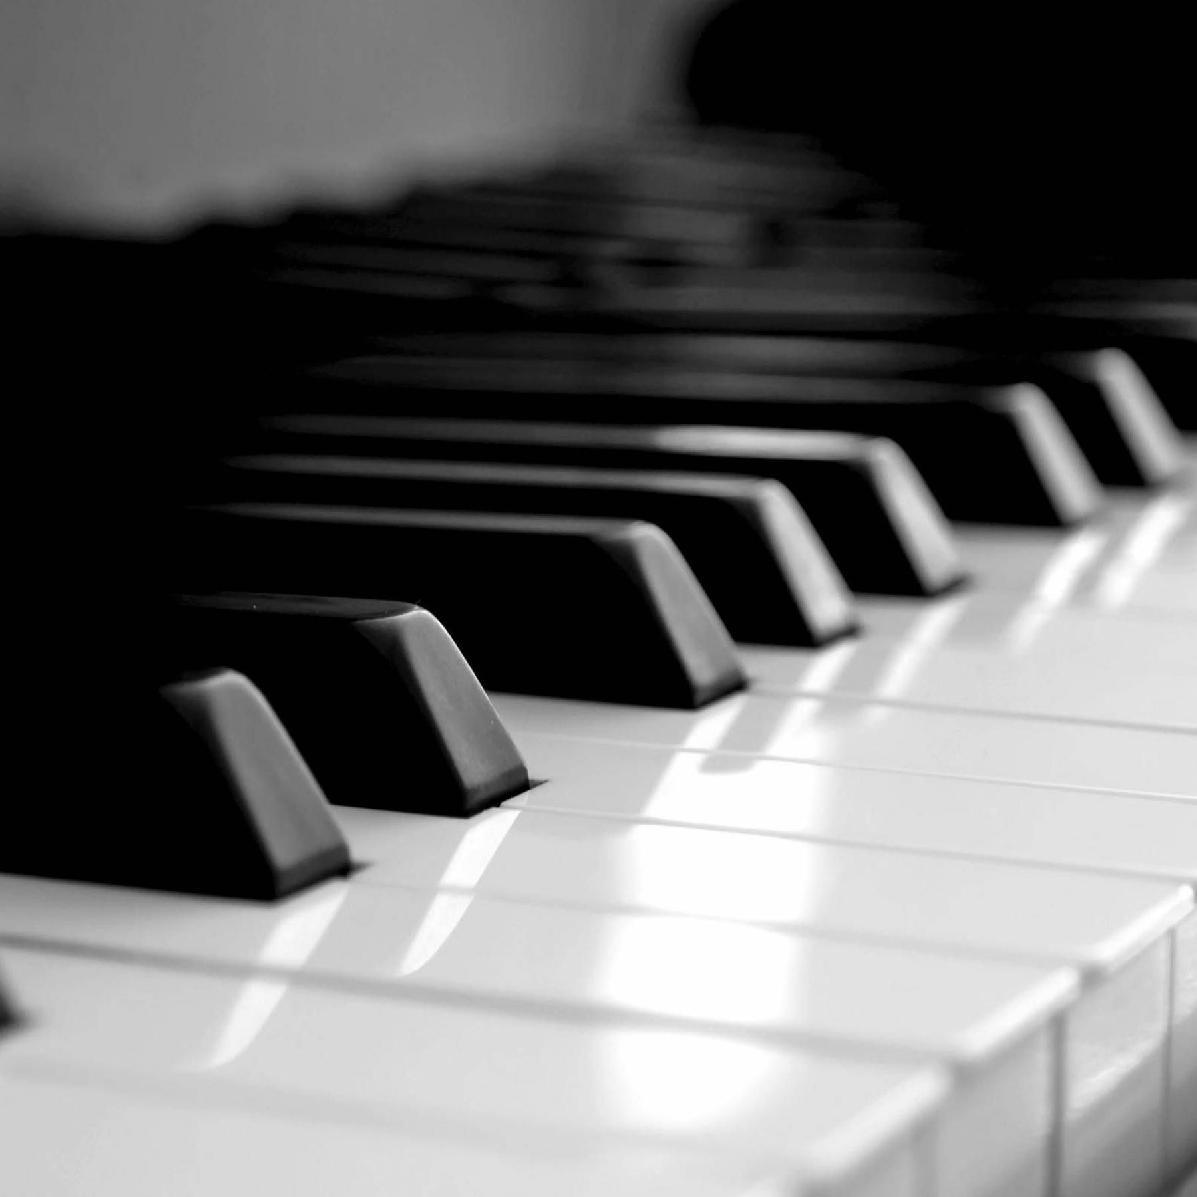 klaviriste.jpg